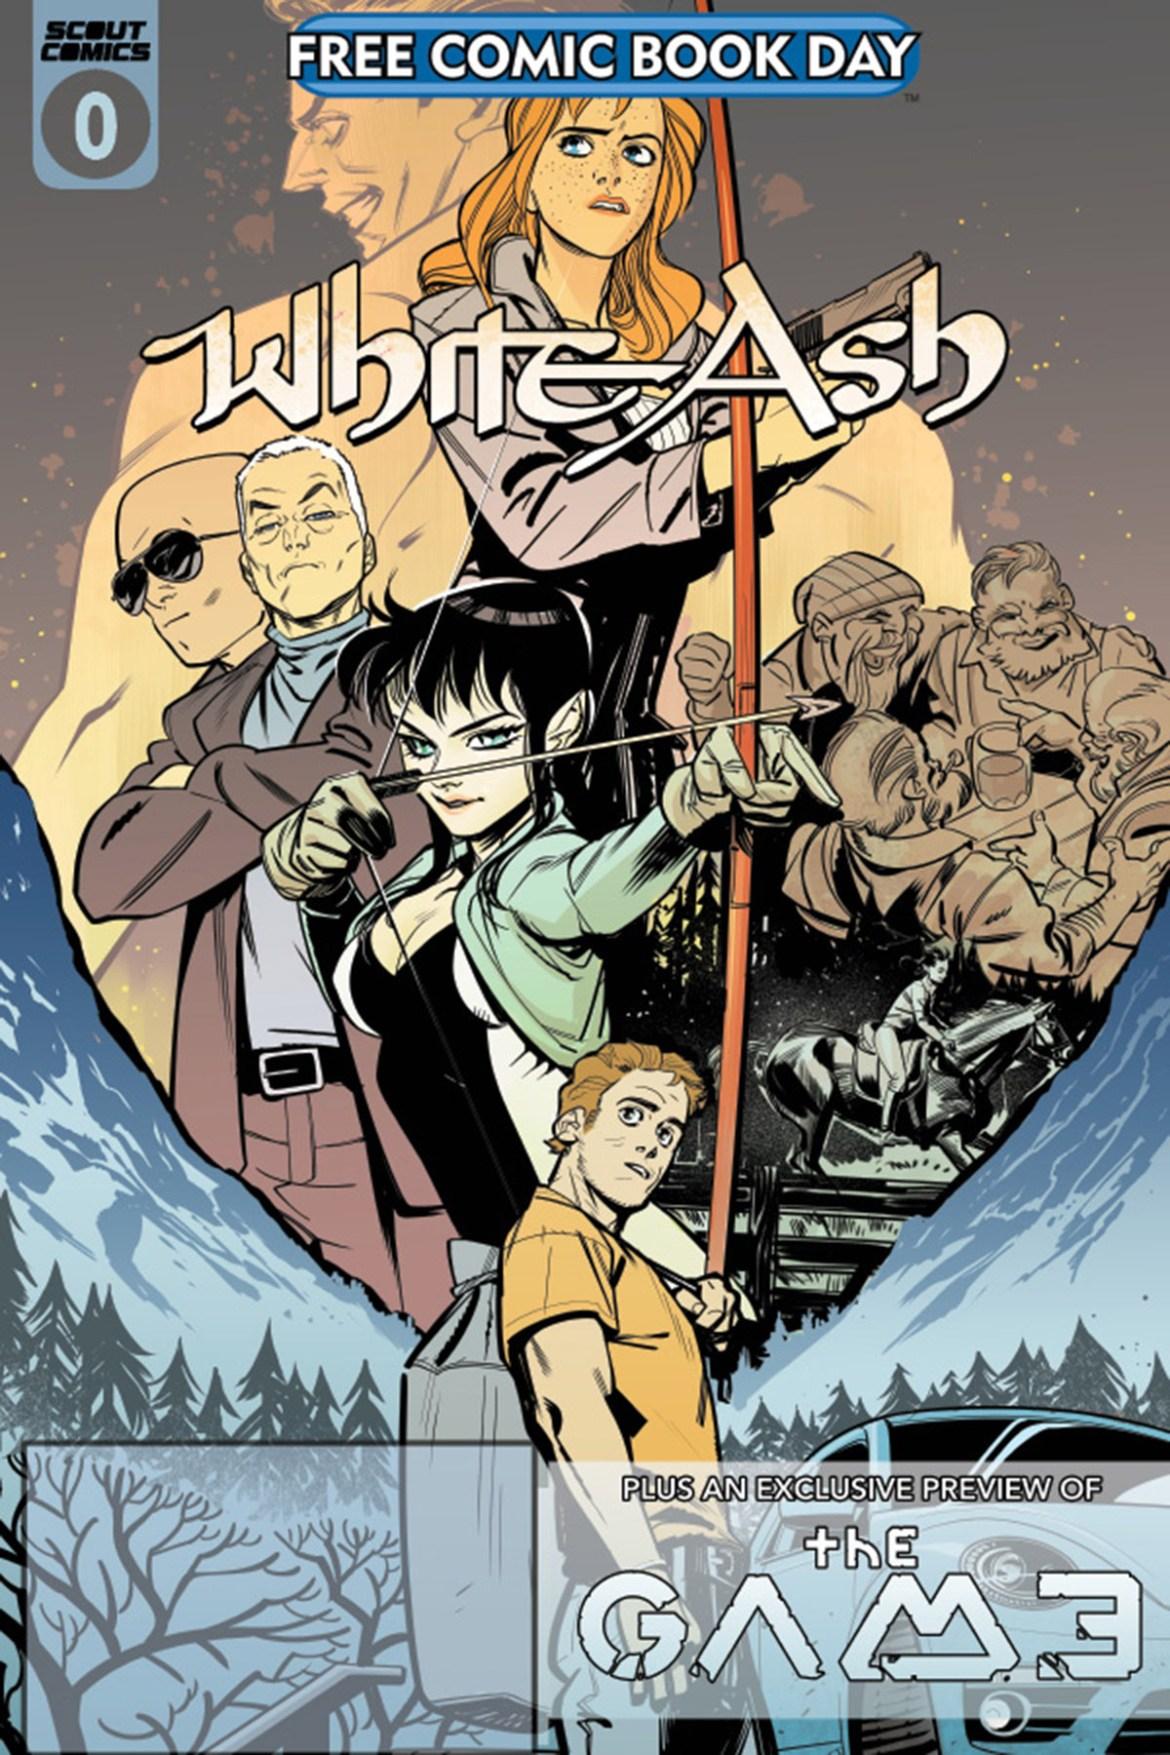 FCBD21_SILVER_Scout-Comics_White-Ash Complete Free Comic Book Day 2021 comic book line-up announced